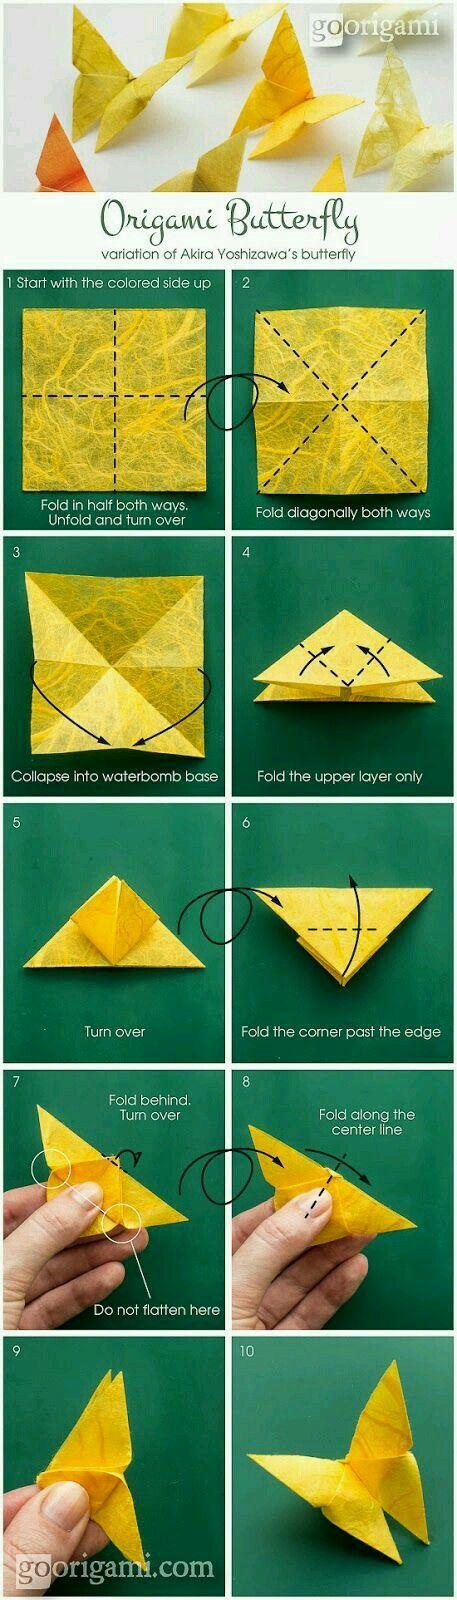 Origami..kagit katlama sanati